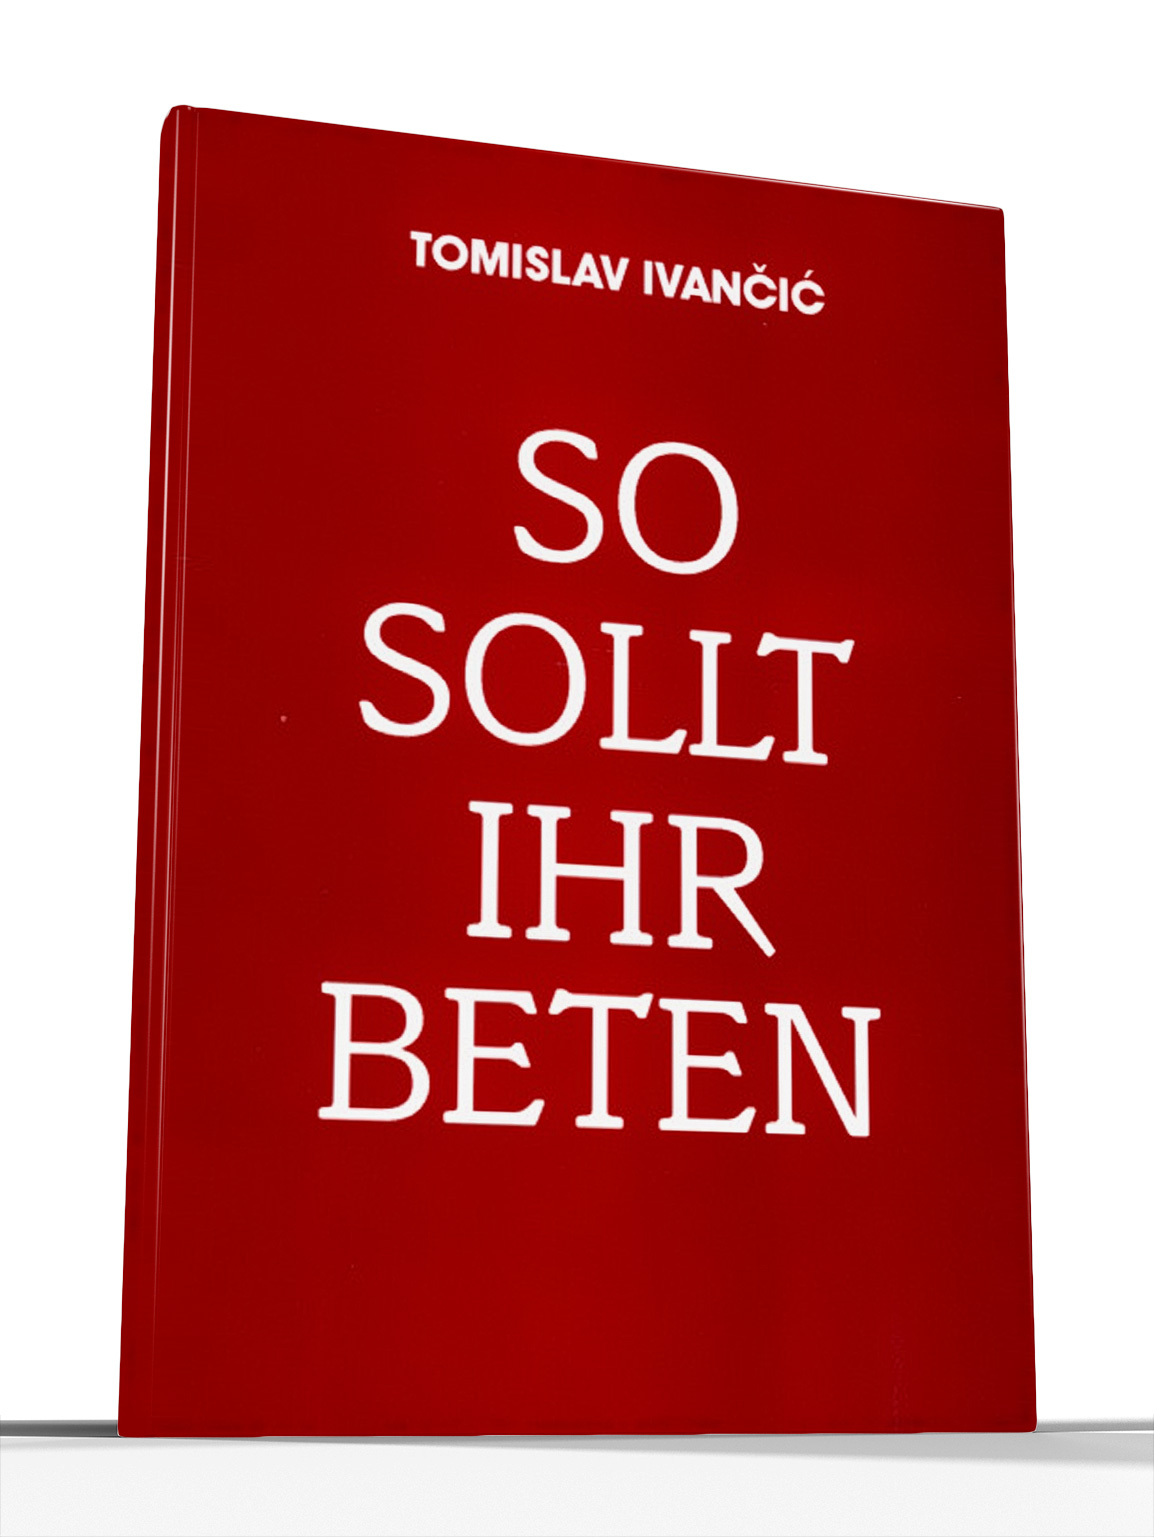 SO SOLLT IHR BETEN - Tomislav Ivančić